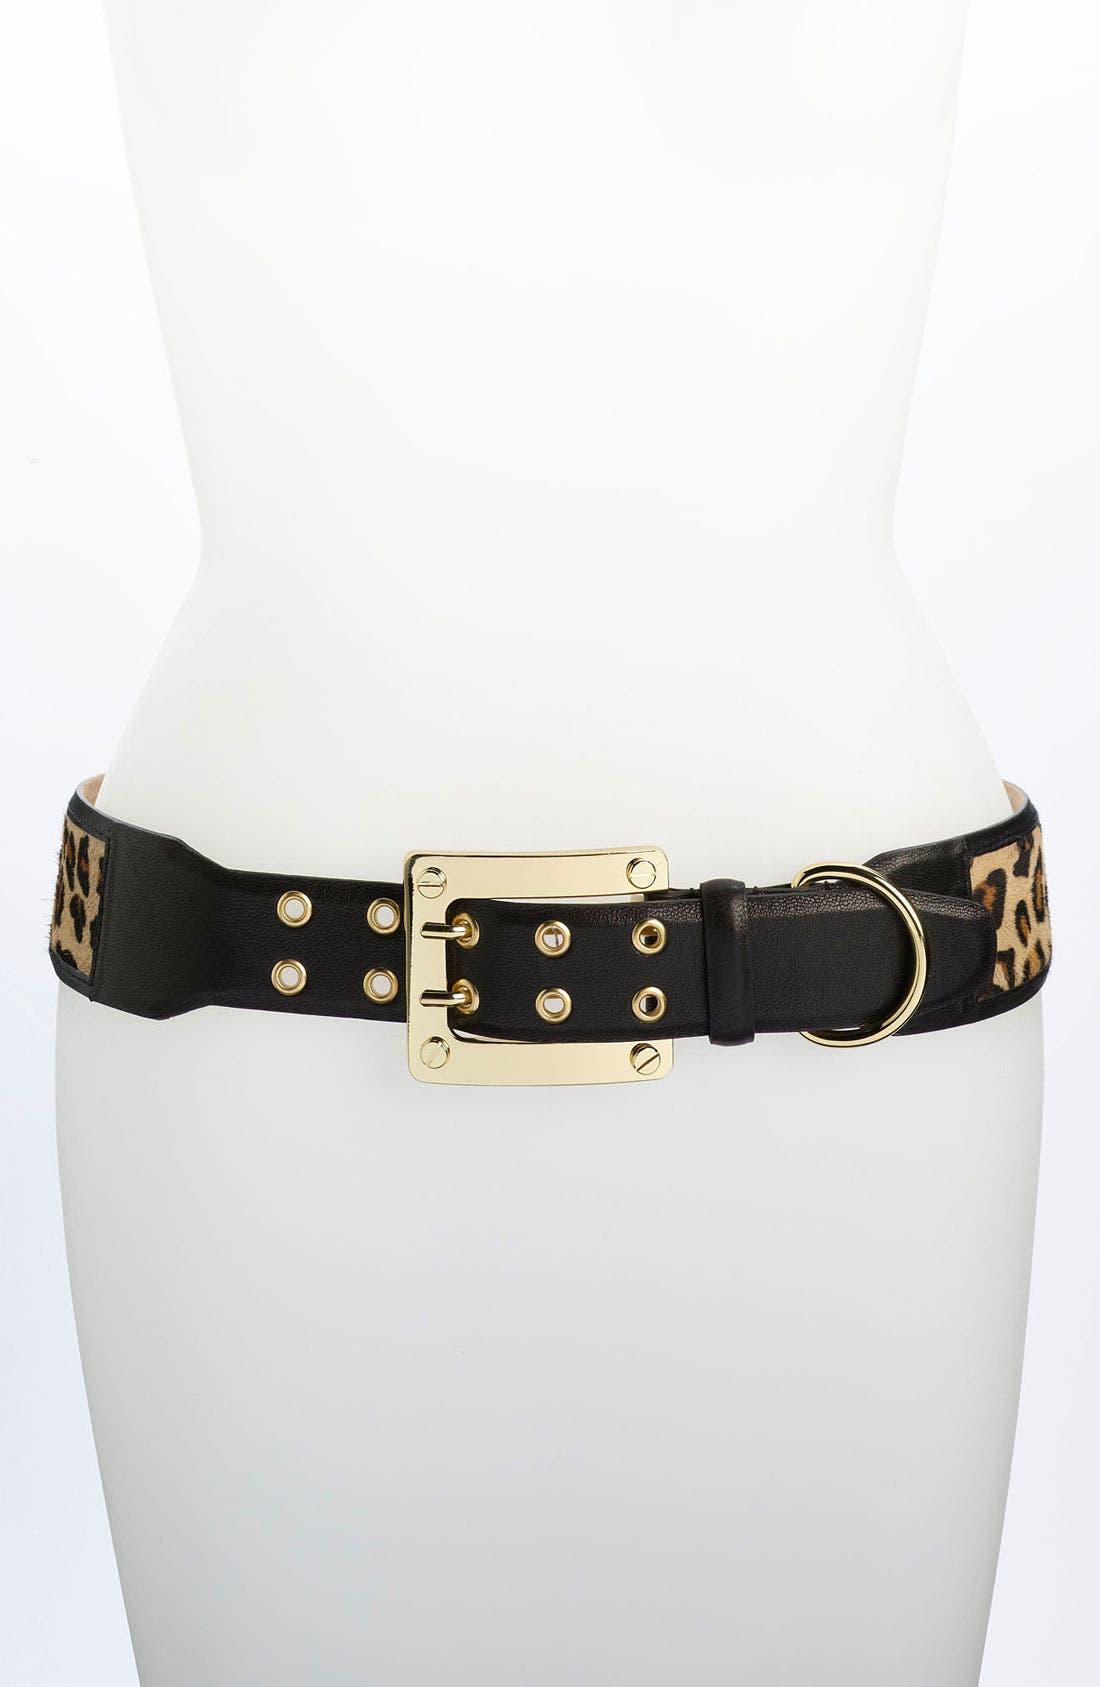 Alternate Image 1 Selected - Rachel Zoe Calf Hair & Leather Belt